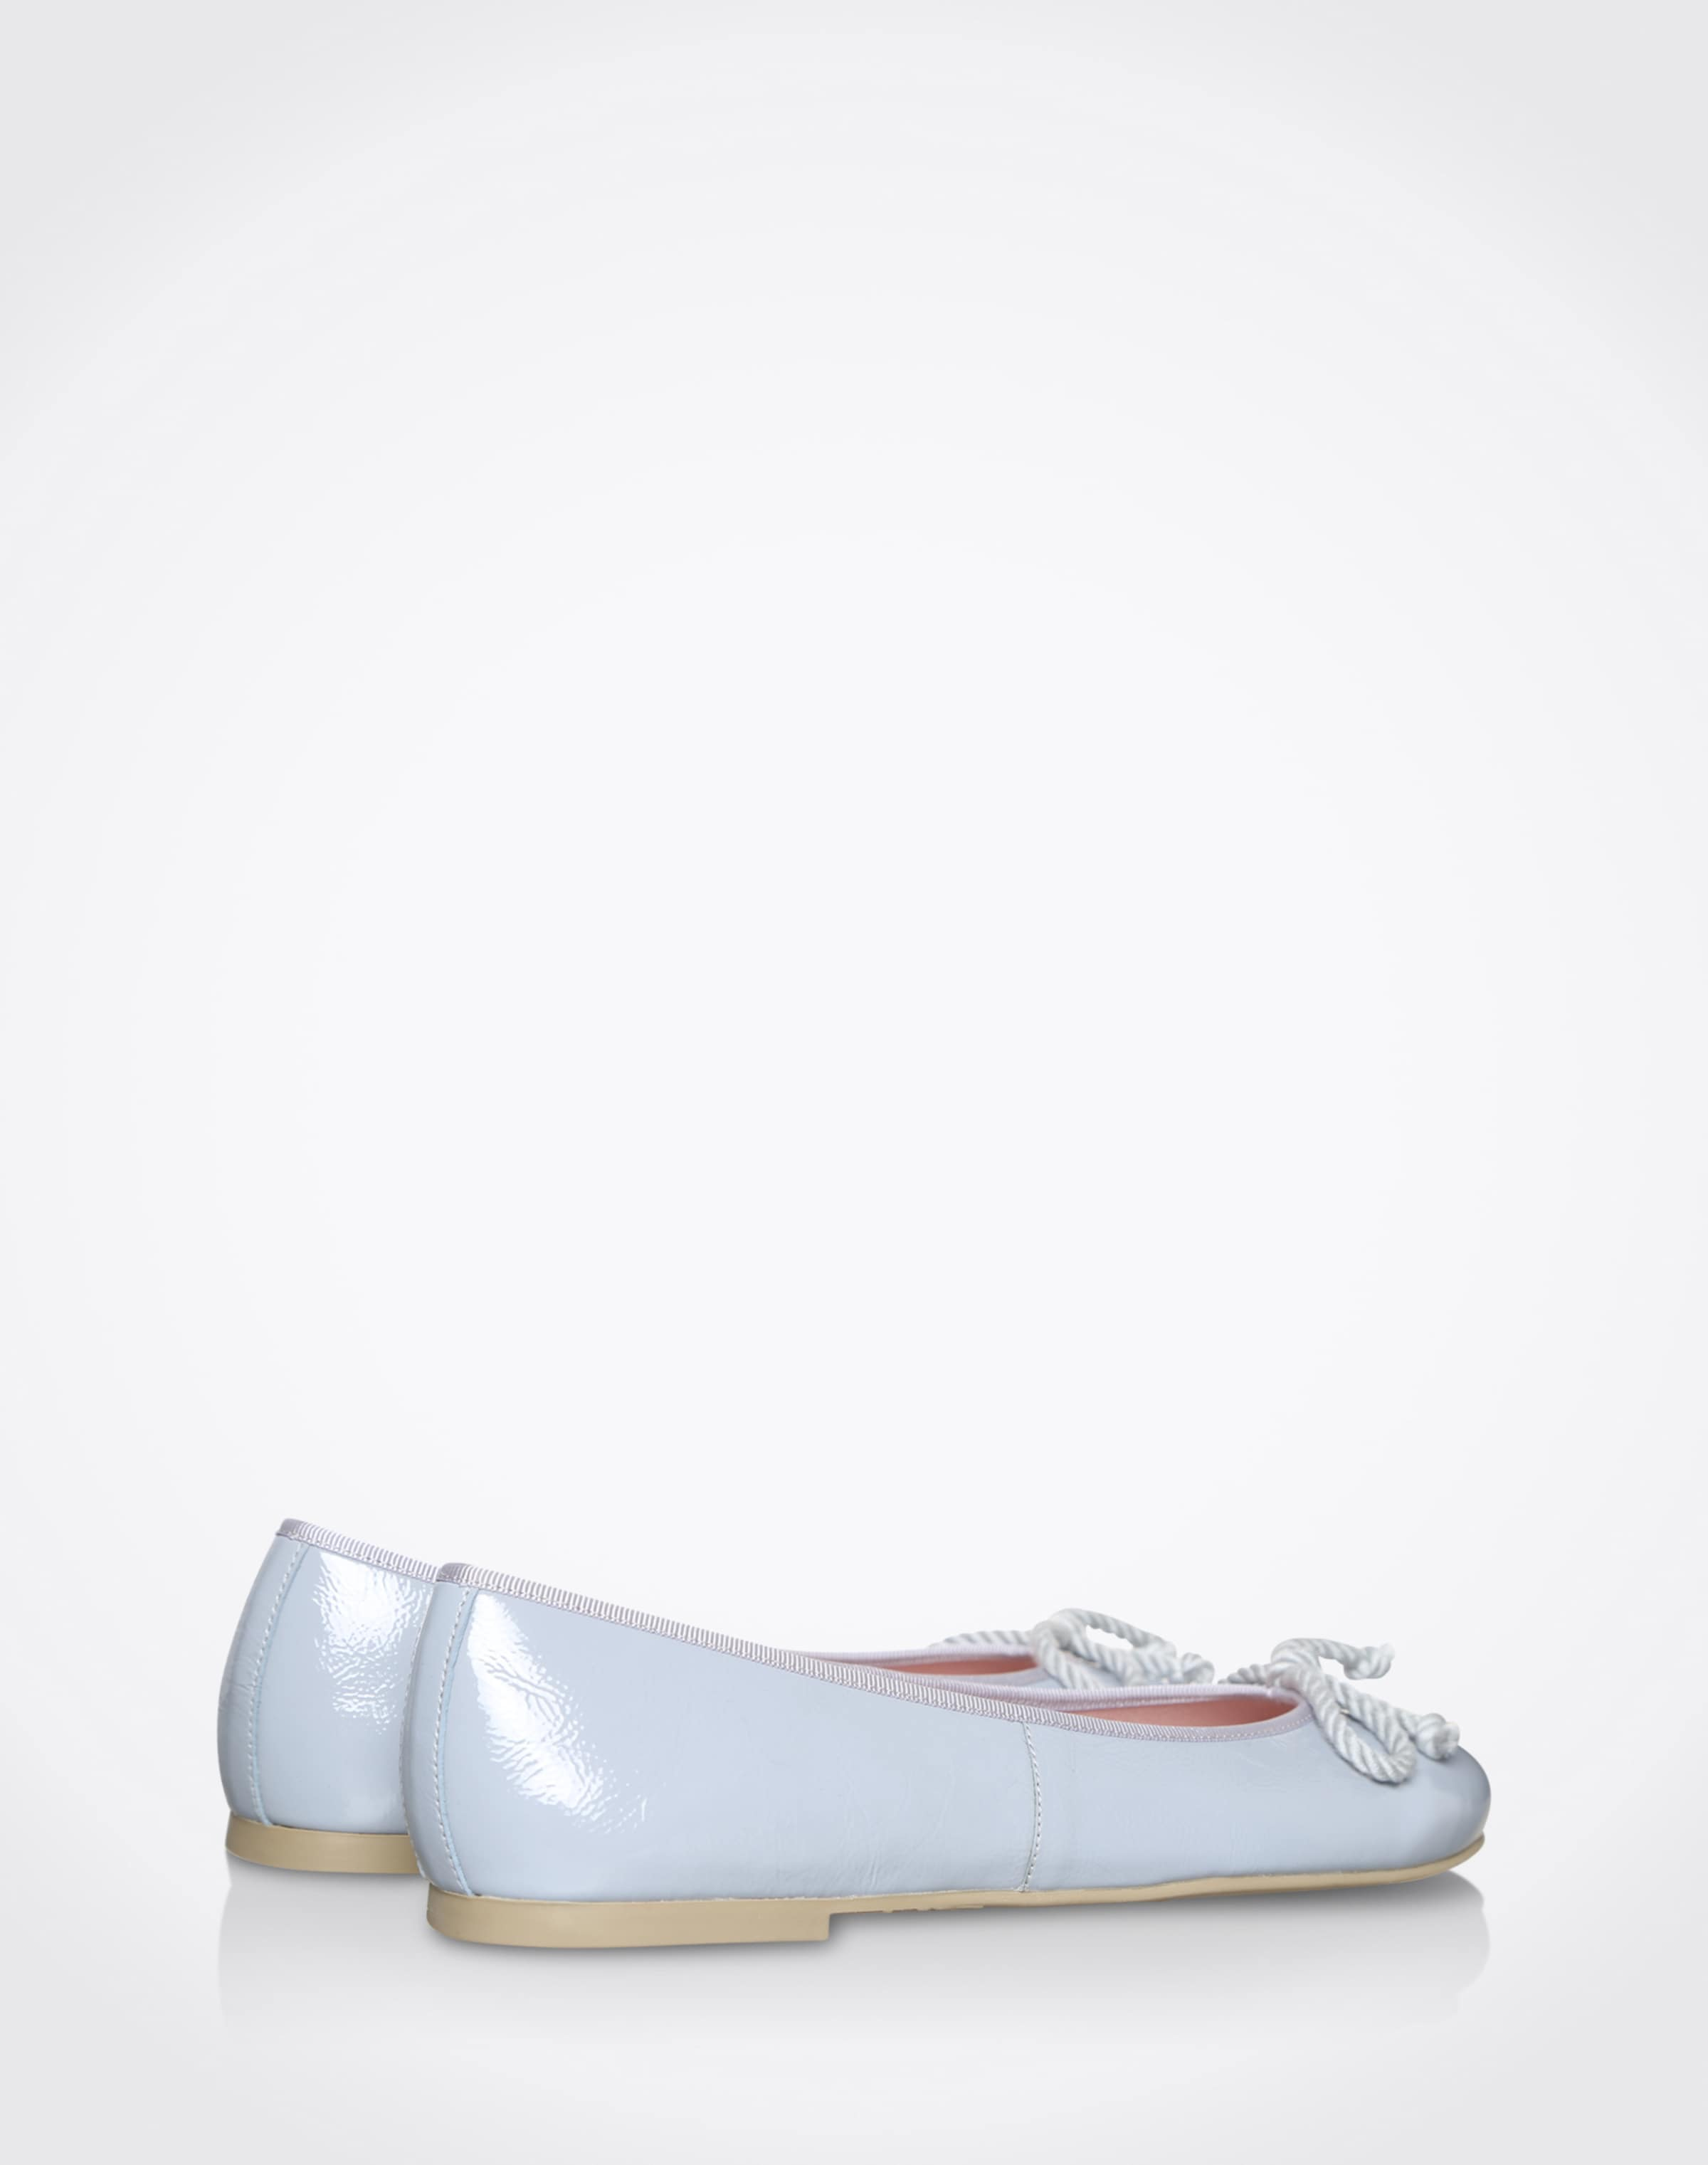 PRETTY BALLERINAS Ballerina aus Leder 'Ipnotic' Bester Großhandel Billig Erkunden MYw74PJ6B